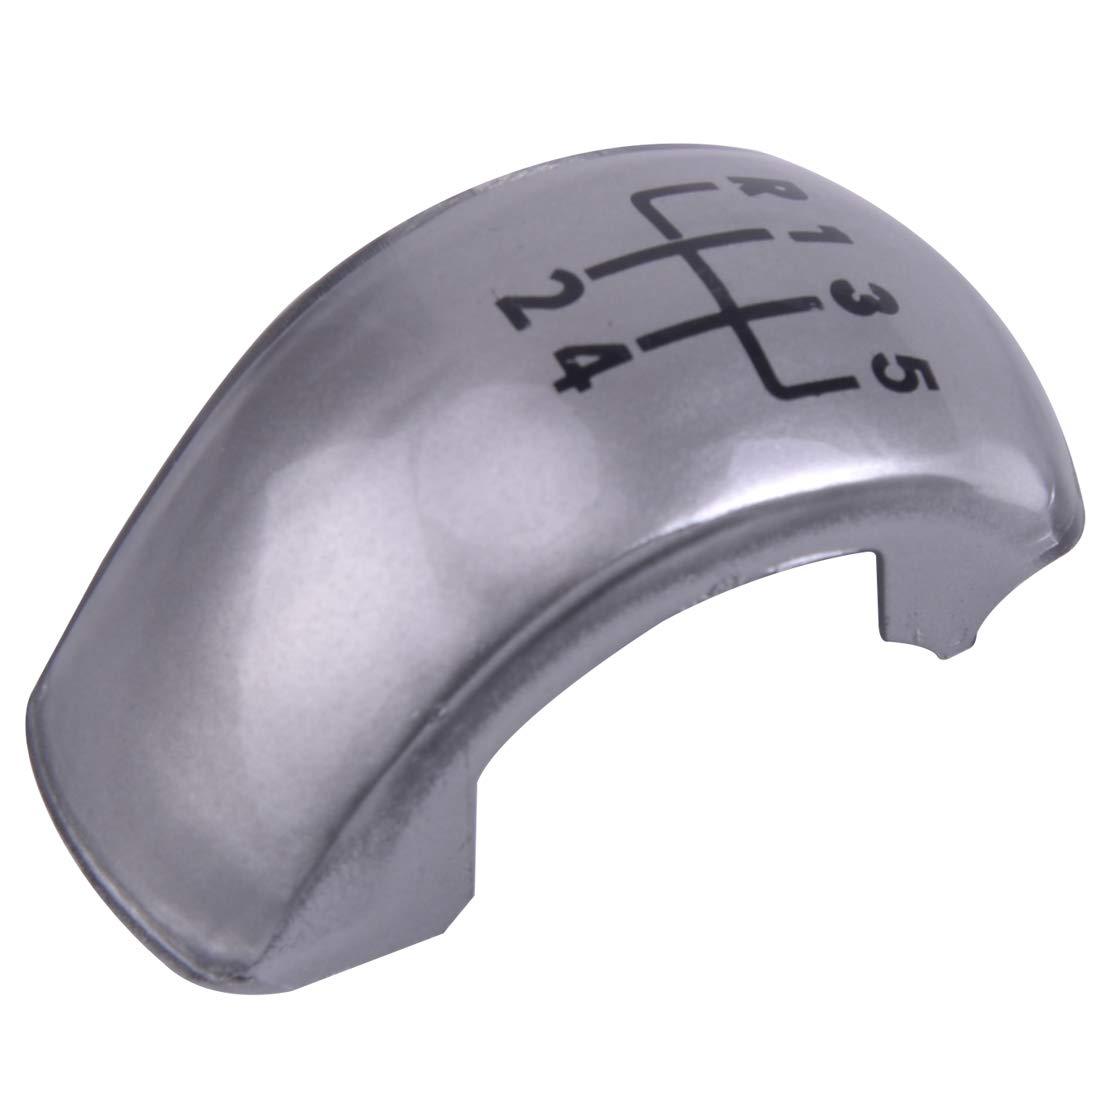 beler 5 Speed Manual Stick Gear Shift Knob Cap Cover Enblem Badge